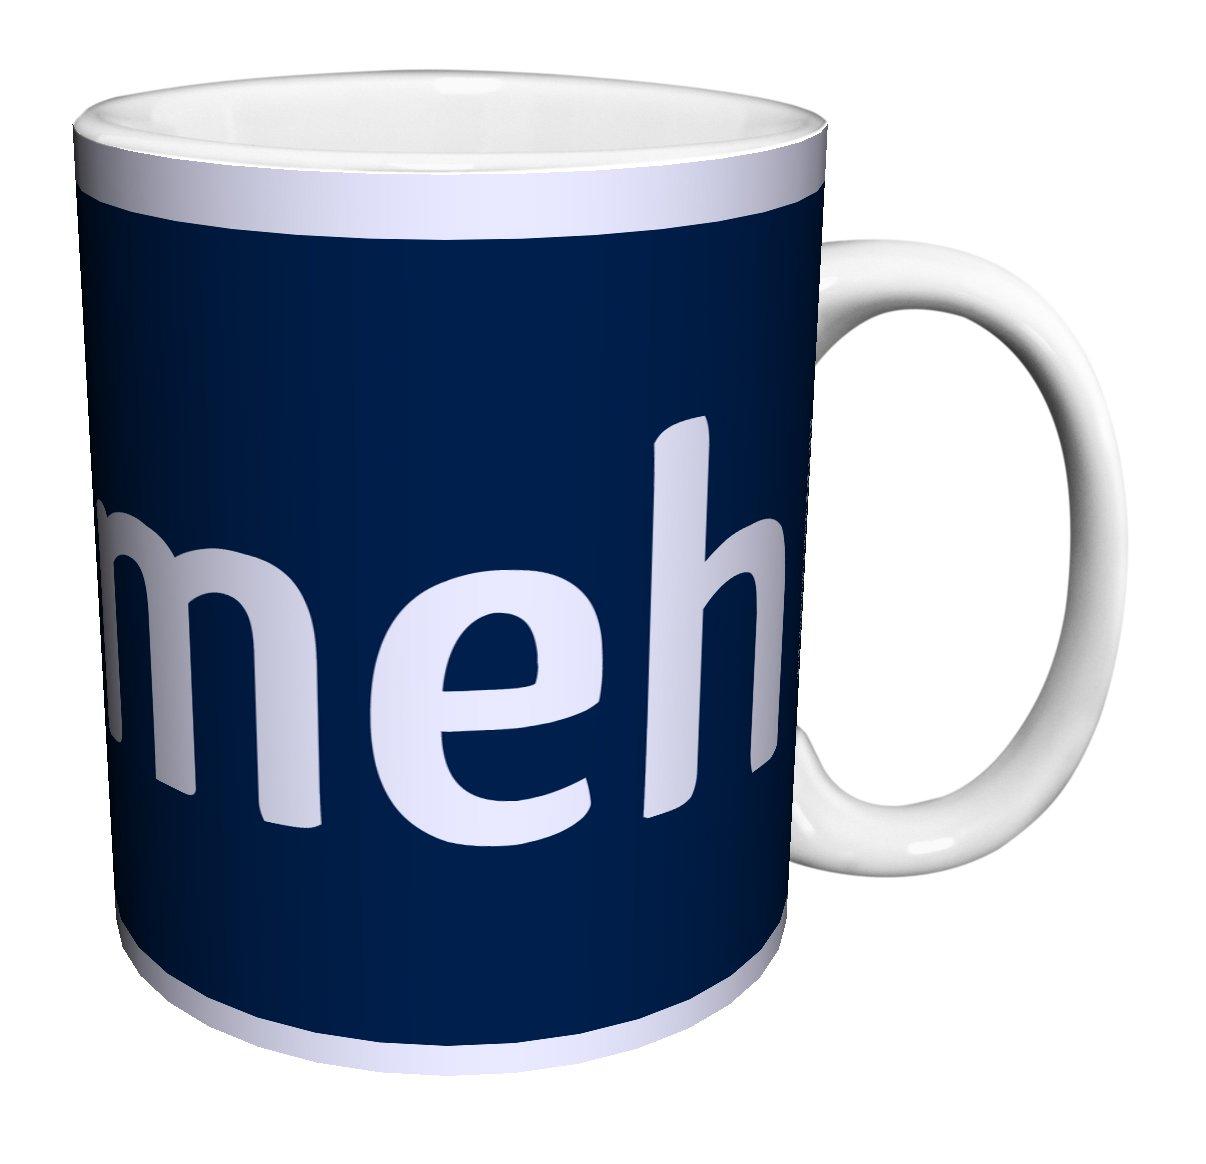 Snorg Tees Meh Novelty Lifestyle College Attitude Humor Ceramic Gift Coffee (Tea, Cocoa) 11 Oz. Mug